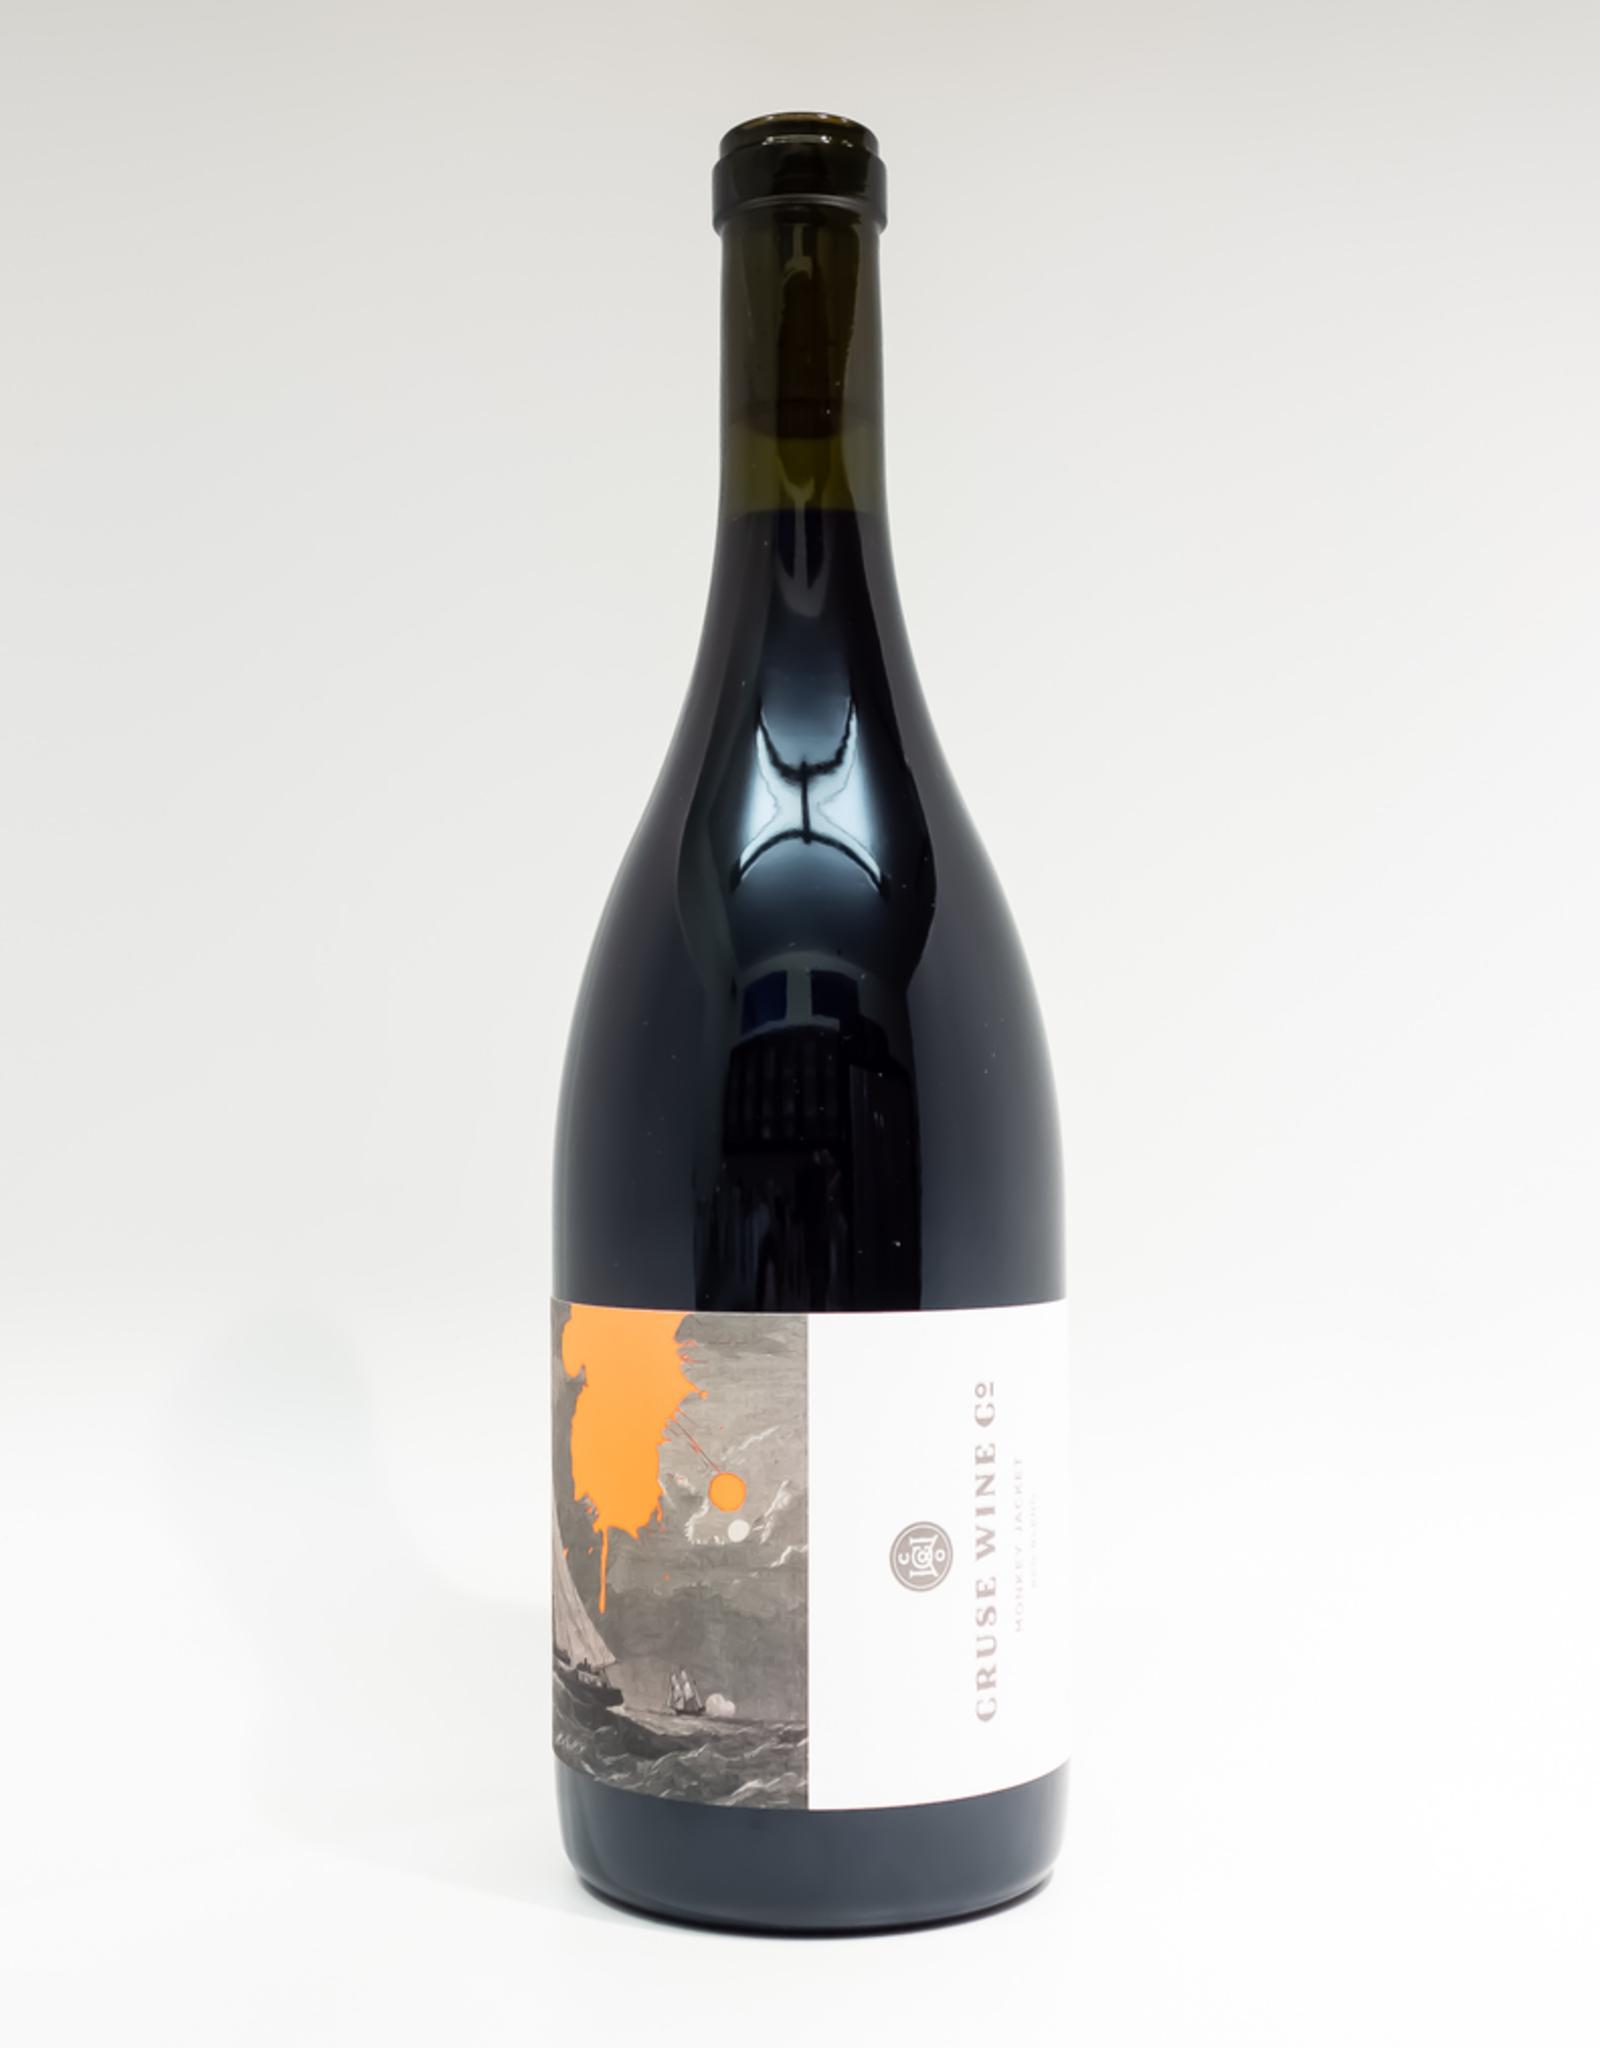 Wine-Red-Light Cruse Wines Co. 'Monkey Jacket' North Coast 2018